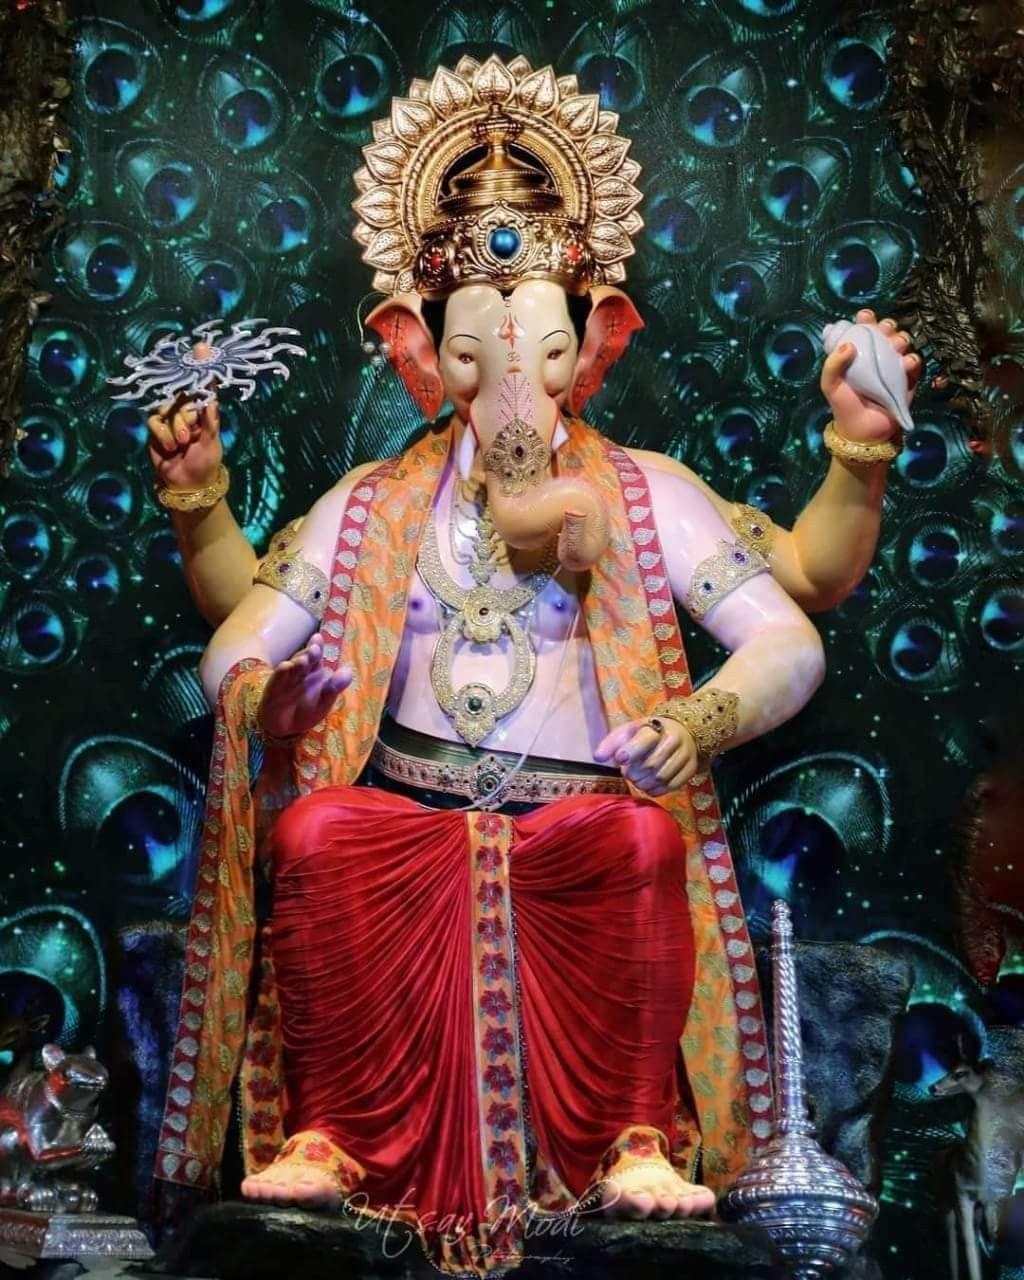 Pin By Kamlesh On Ka In 2019: Lord Ganesha, Ganesha, Pure